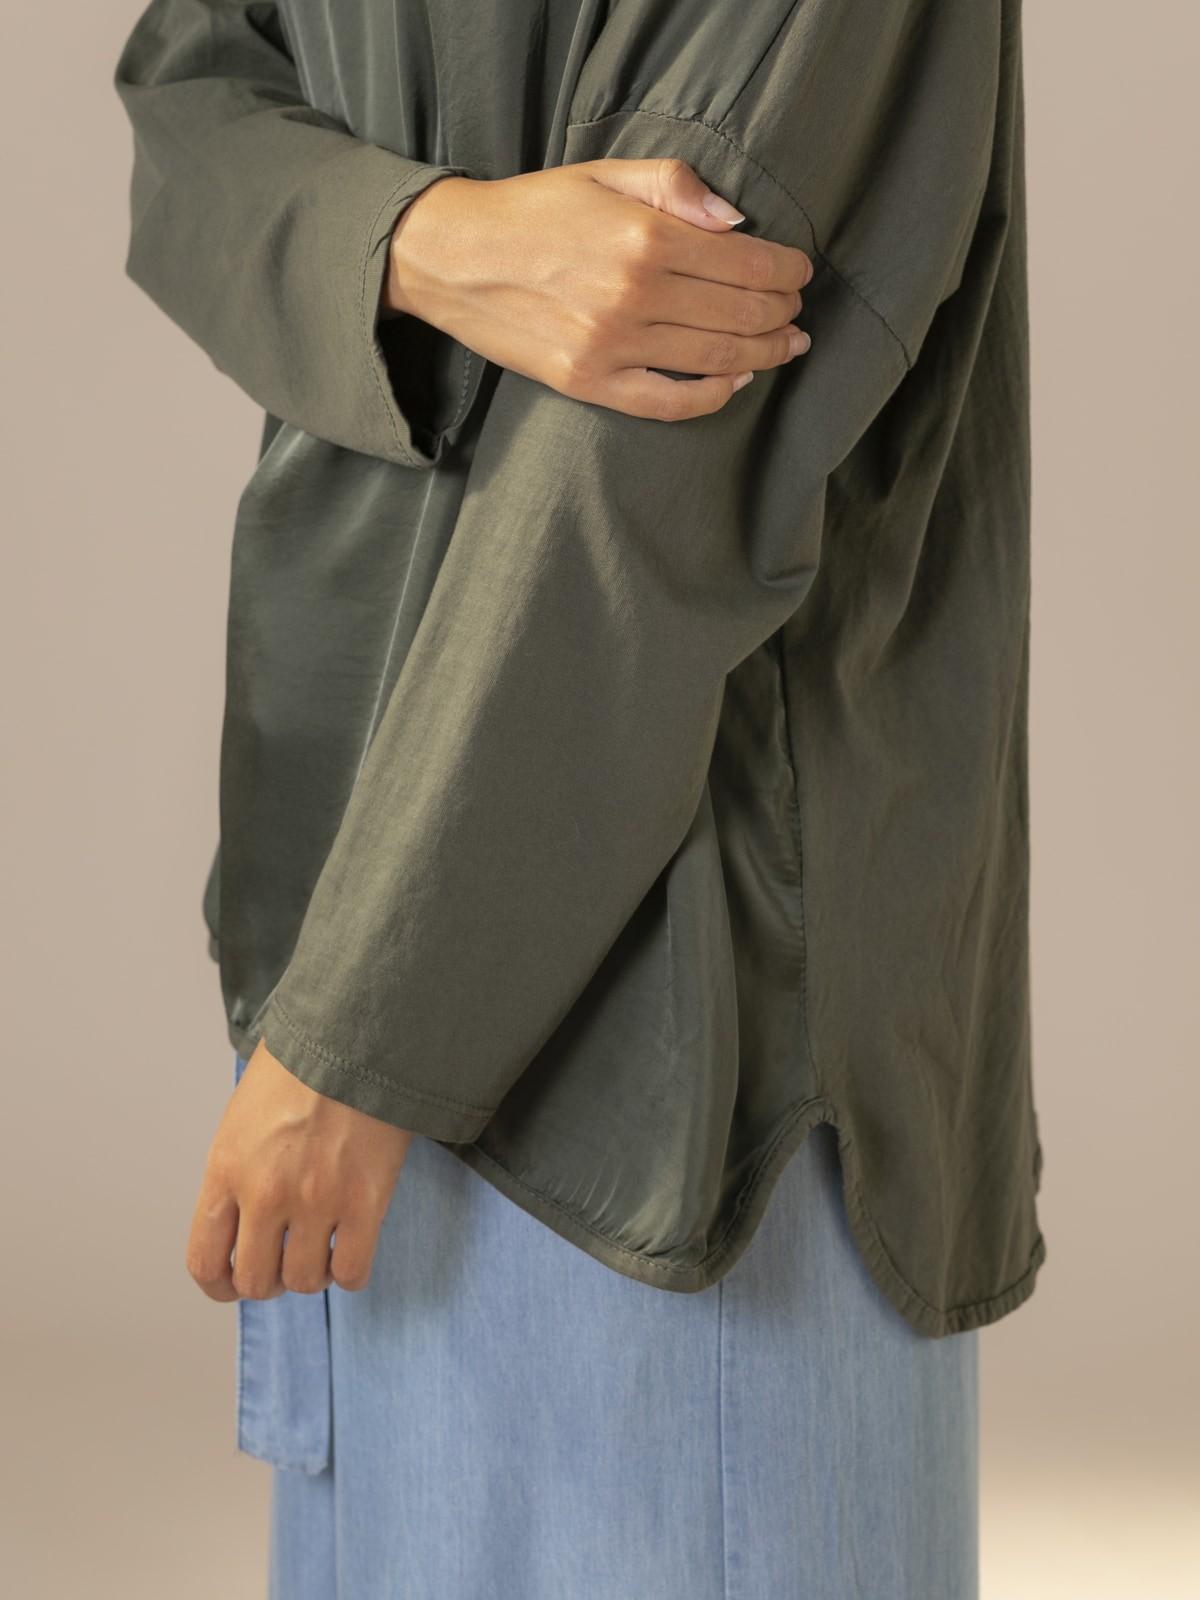 Camiseta mujer oversize chic Caqui